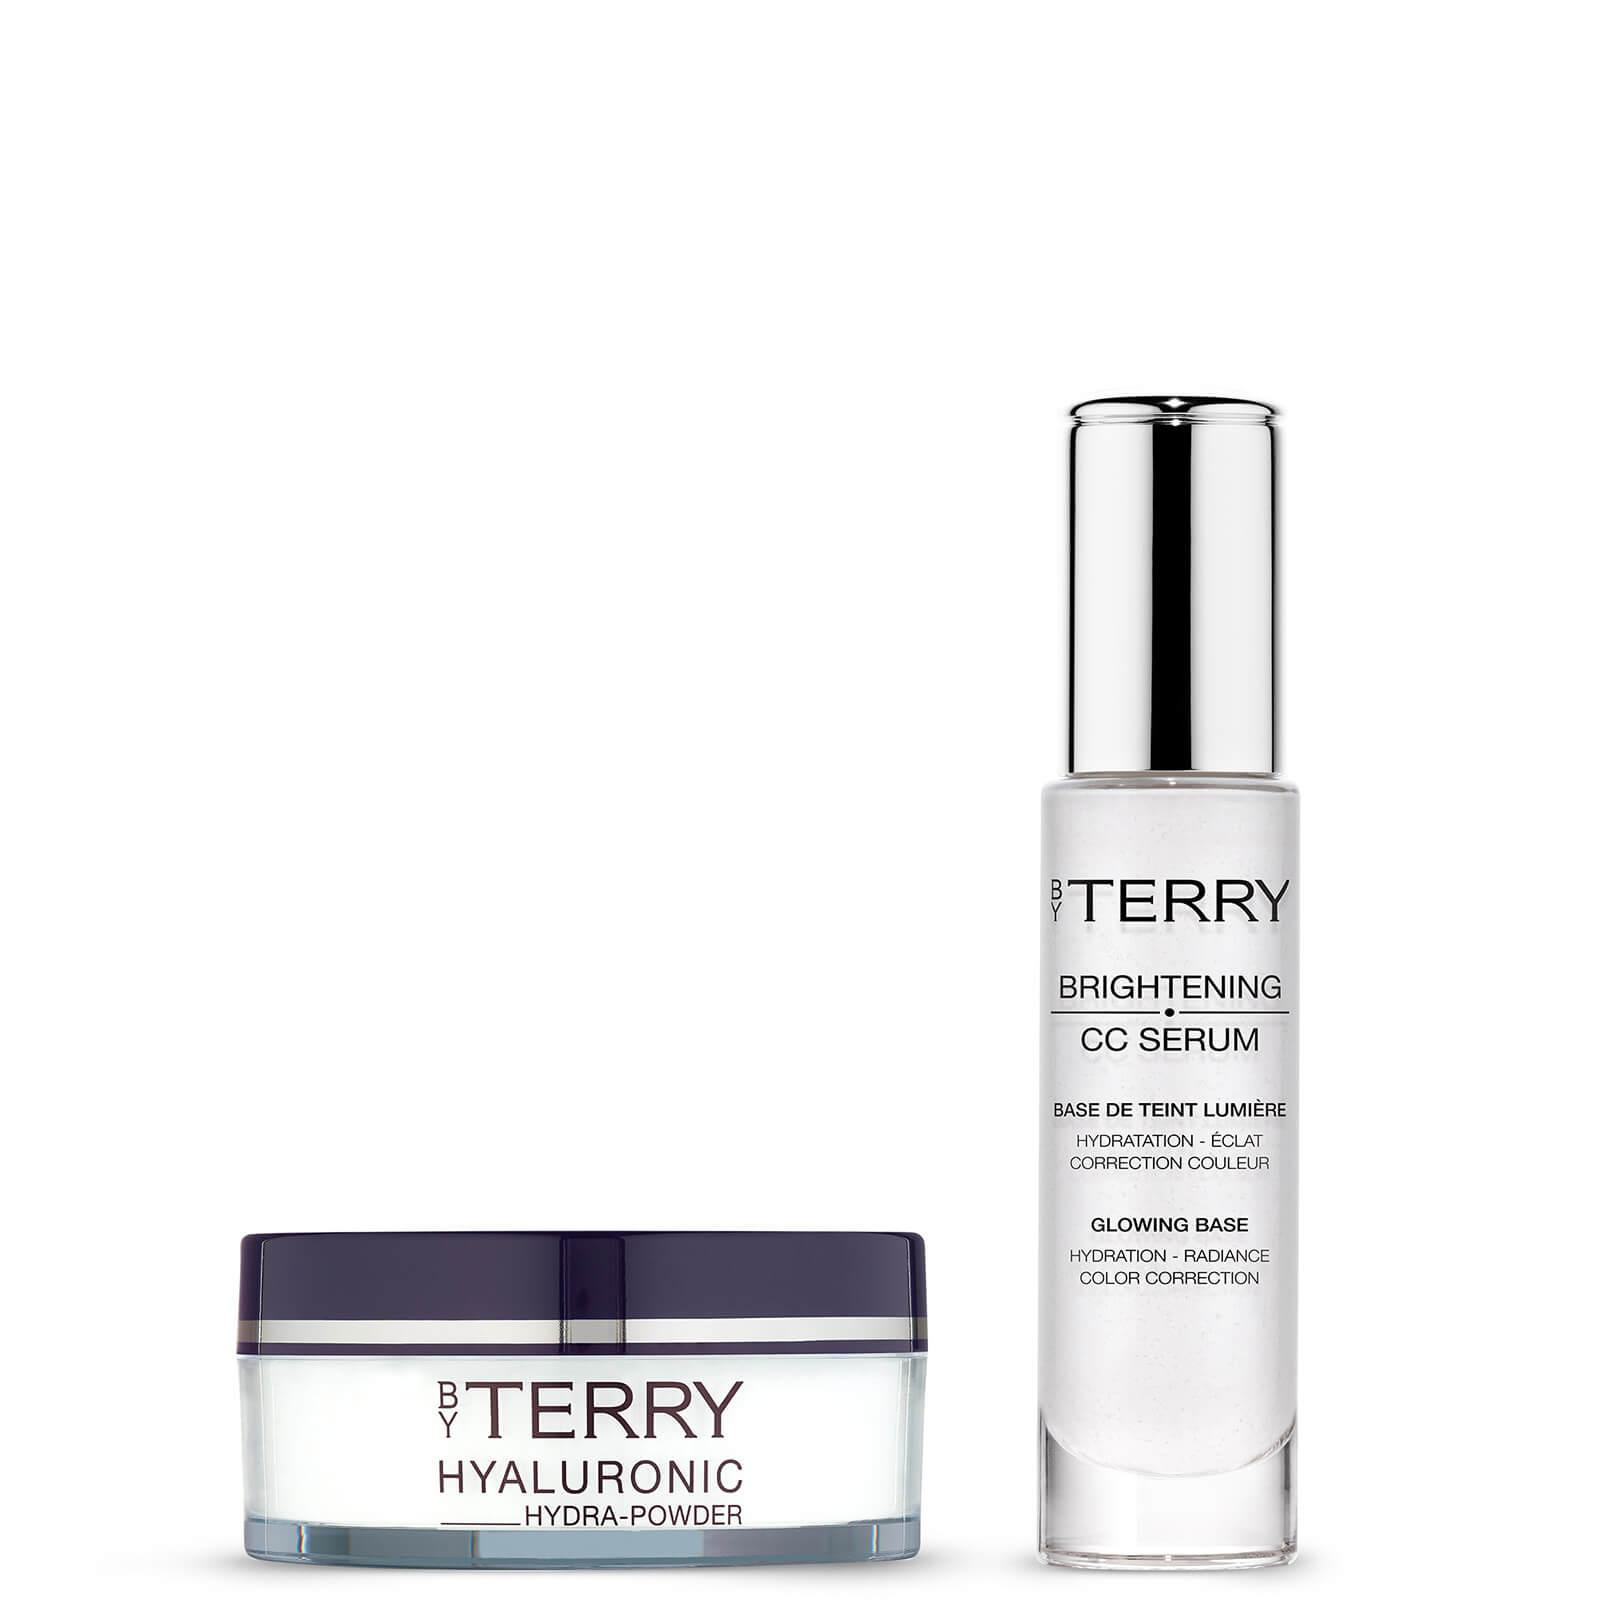 Купить Набор By Terry Hyaluronic Hydra-Powder и Cellularose CC Serum - № 1 Безупречный свет